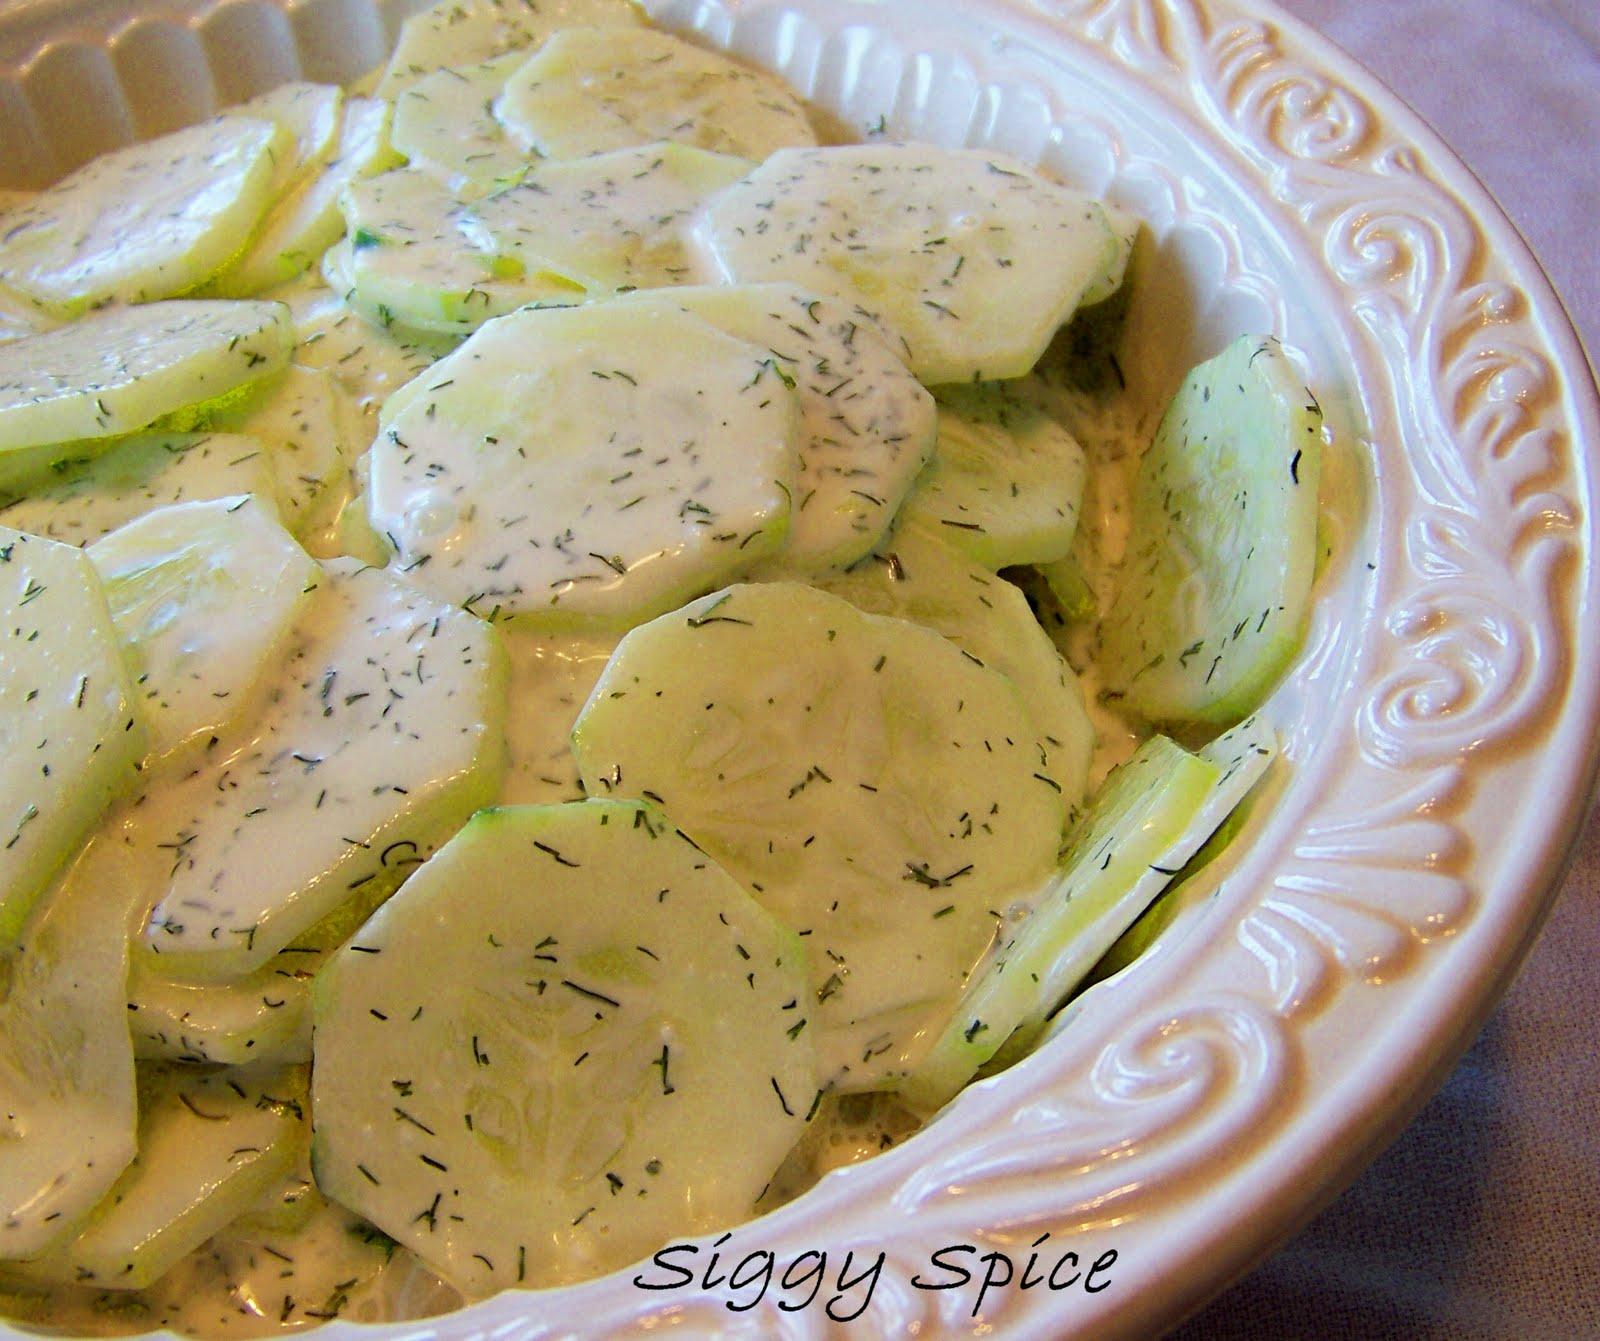 Siggy Spice: Creamy Dill Cucumber Salad